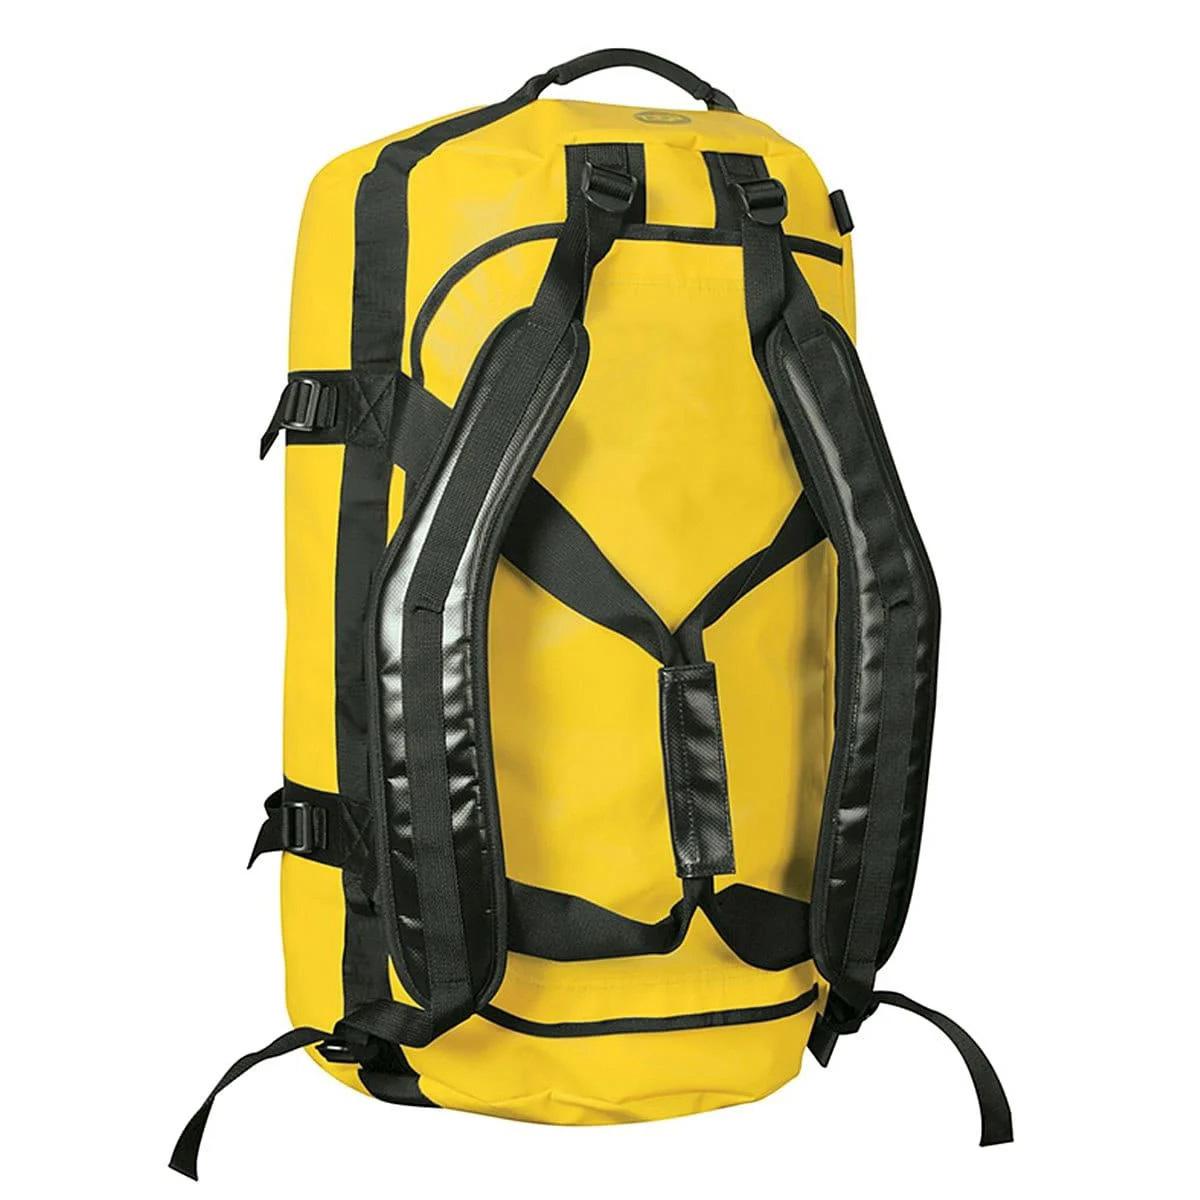 Stormtech Waterproof Gear Holdall Bag (Large) (One Size) (Ocean Blue/Black)